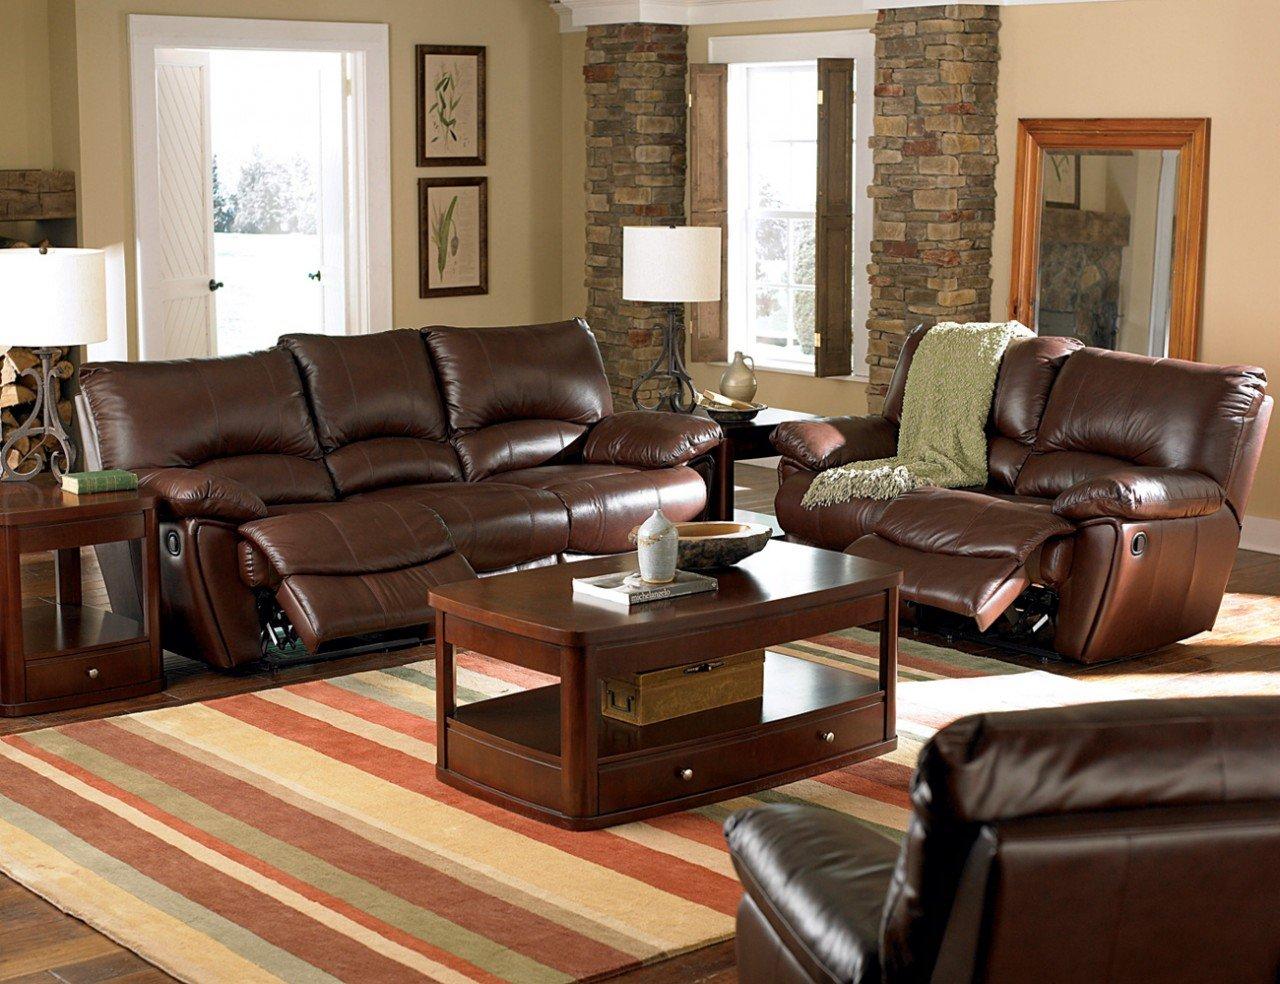 Inland Empire Furniture Mansi Dark Brown Leather Match Motion Reclining Sofa & Love Seat